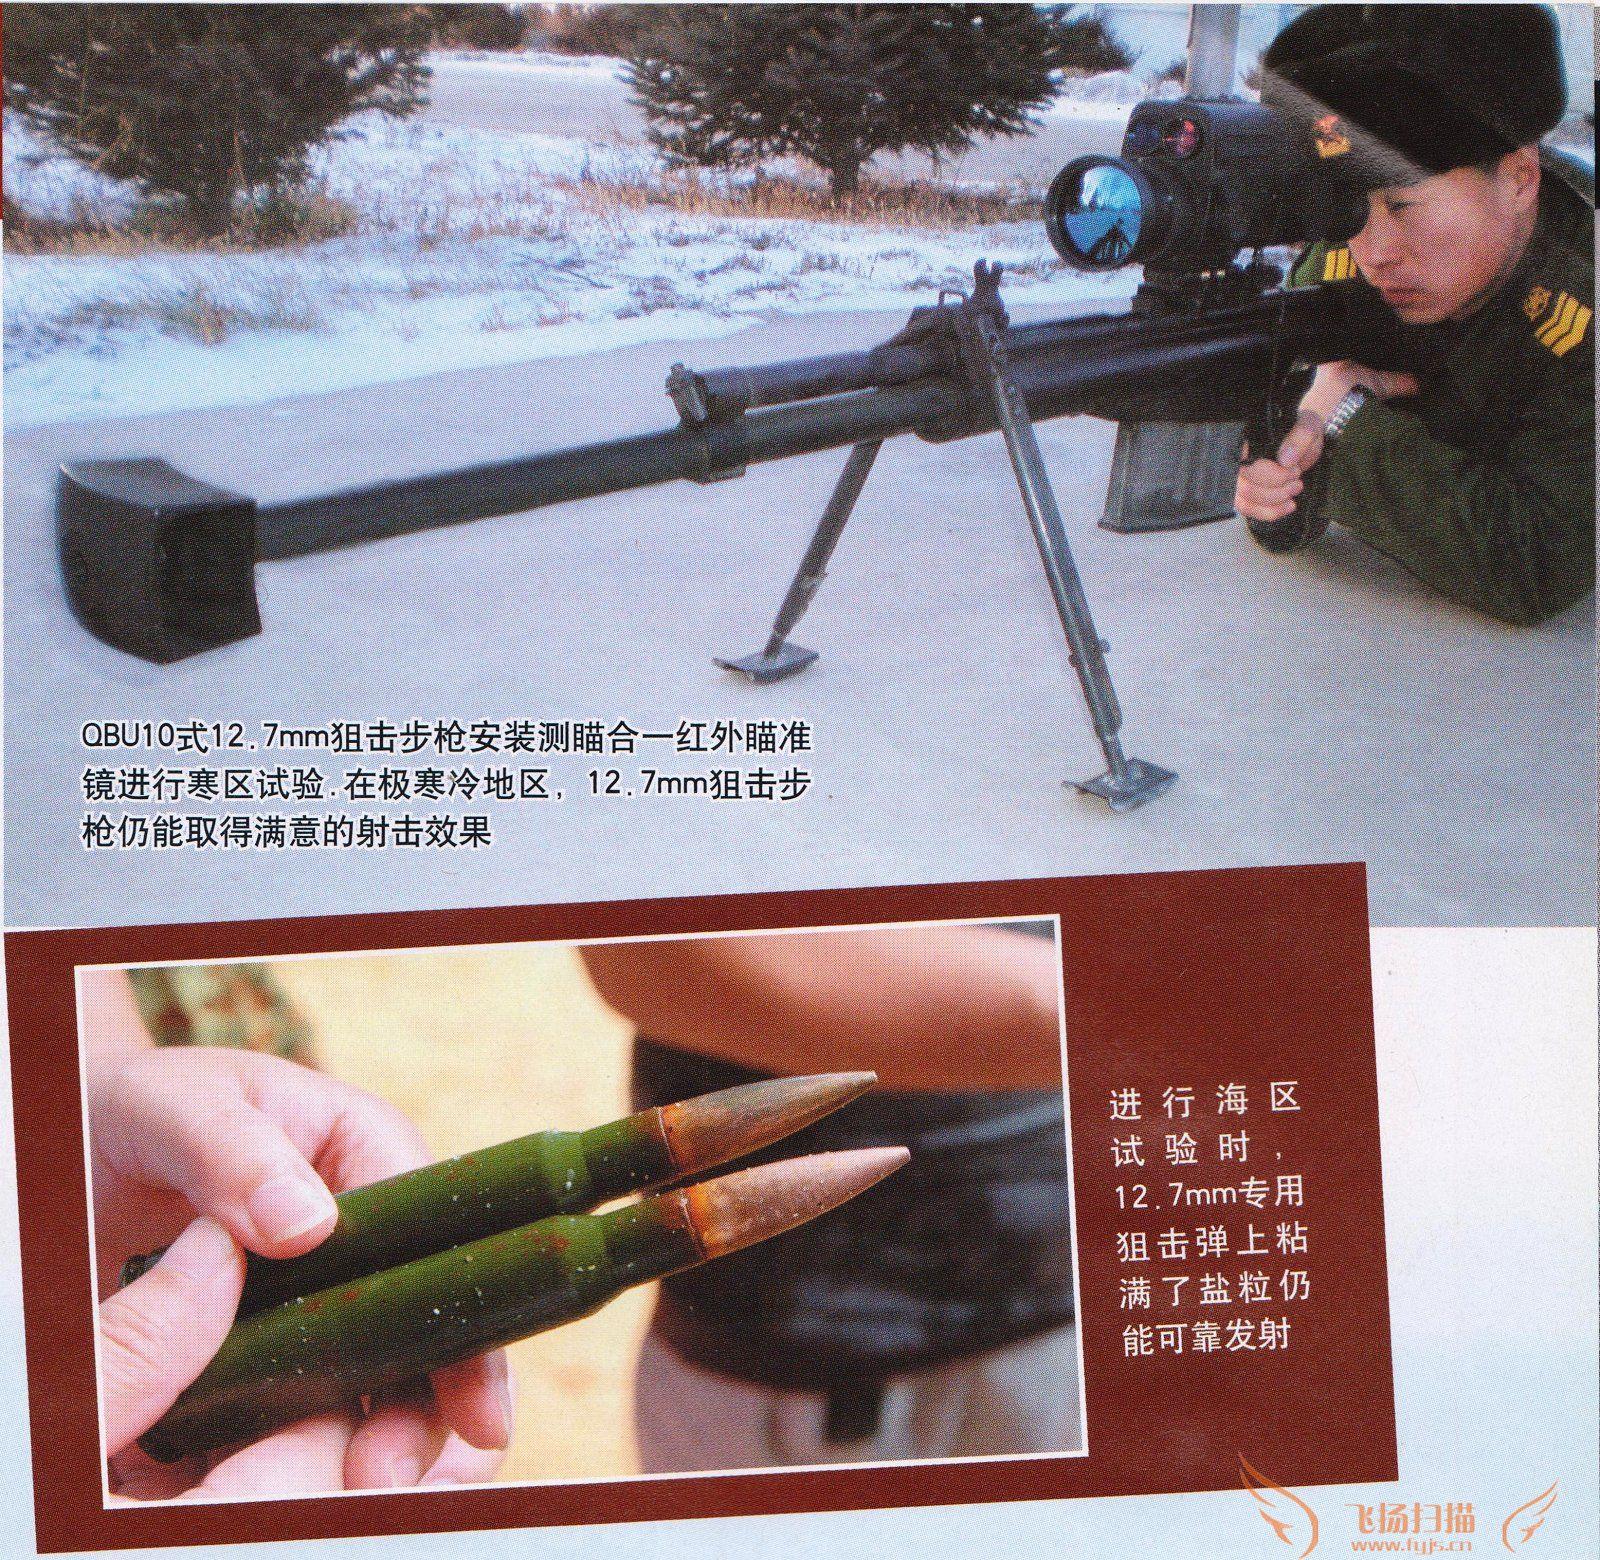 Chinese QBU 10 12 7x108mm Anti-Material Sniper Rifle